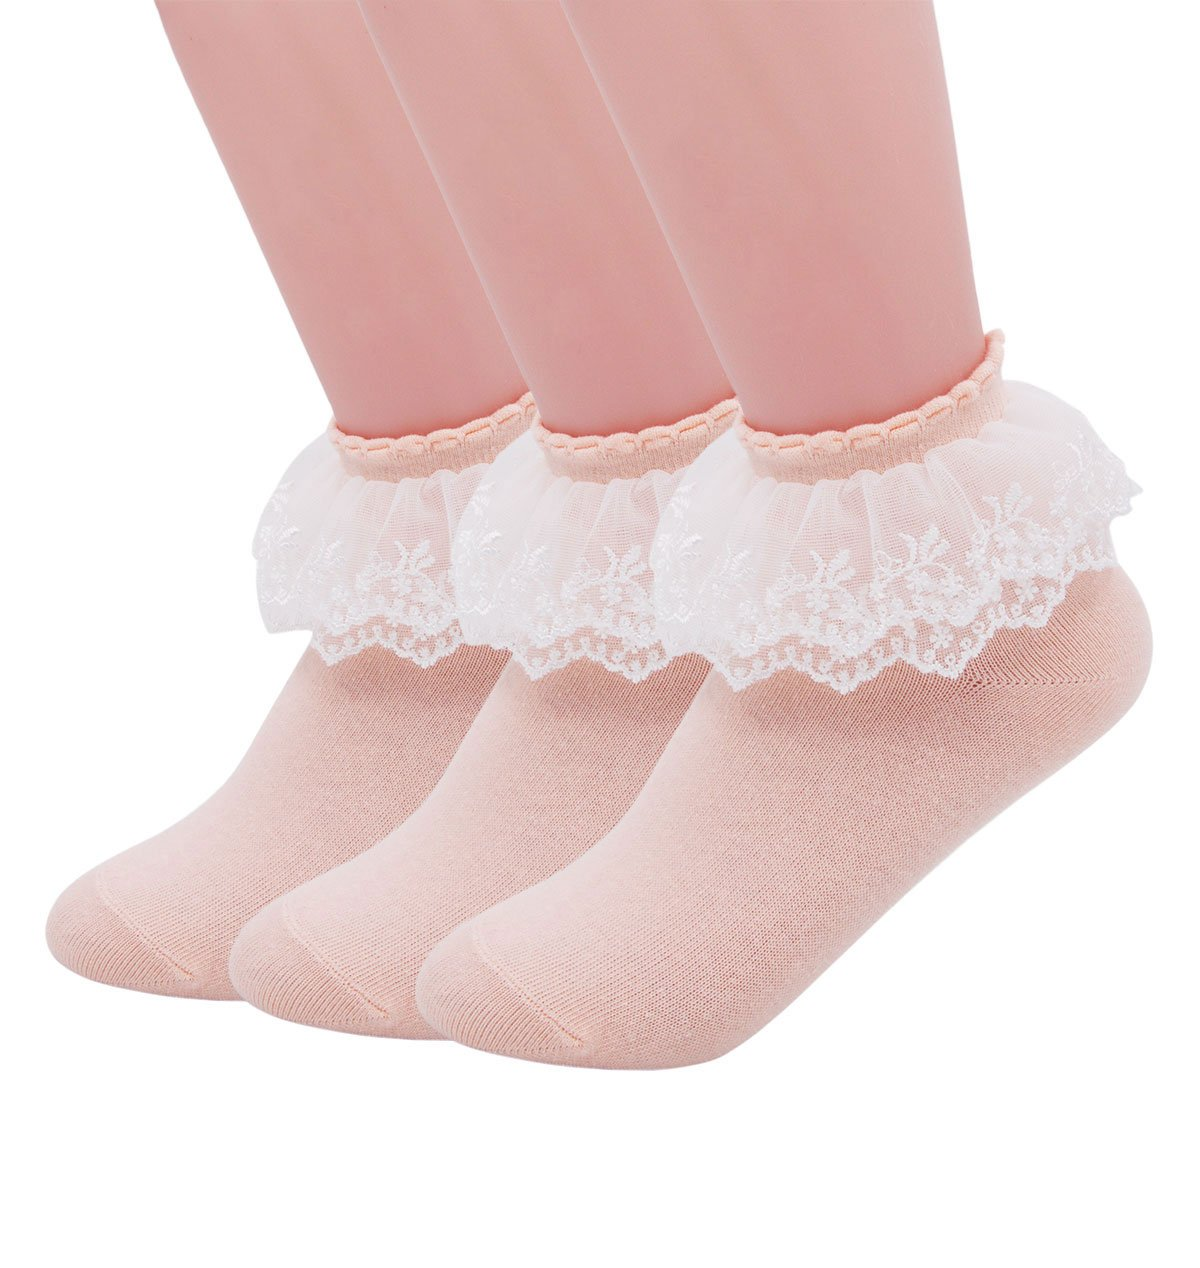 SEMOHOLLI Women Socks, Princess Socks, Lace Socks, Cotton Casual Socks Double-deck With Ruffle Frilly Lace Top (3 Pairs-Light Orange)